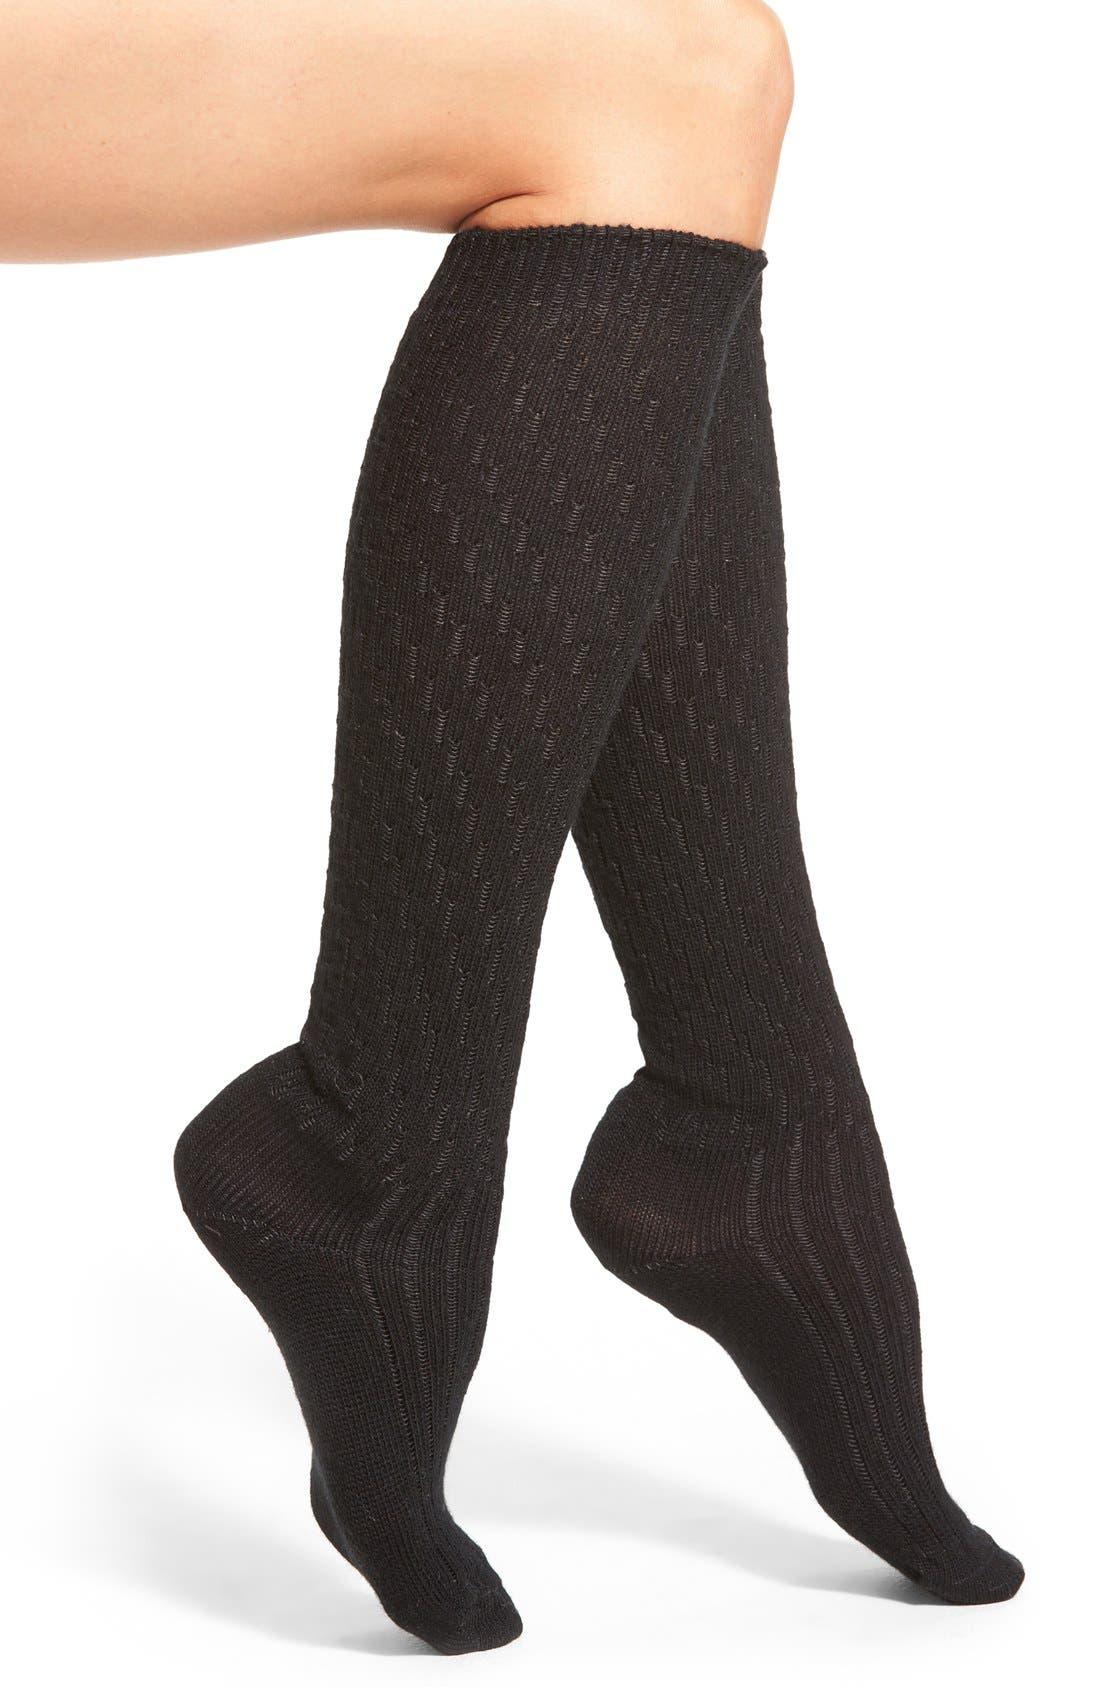 Main Image - Wigwam 'Retro Lilly' Merino Wool Blend Knee High Socks